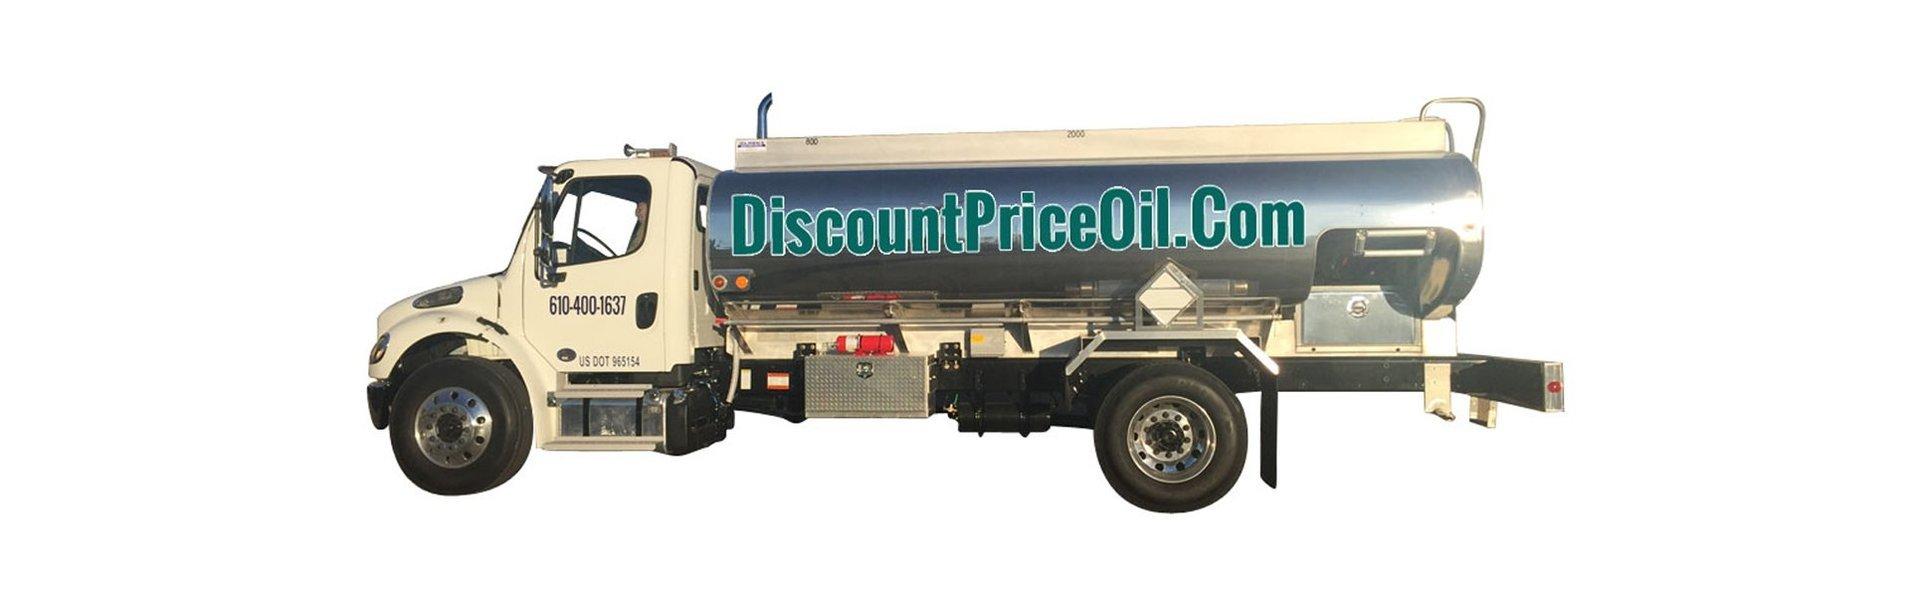 Discount Price Oil Truck